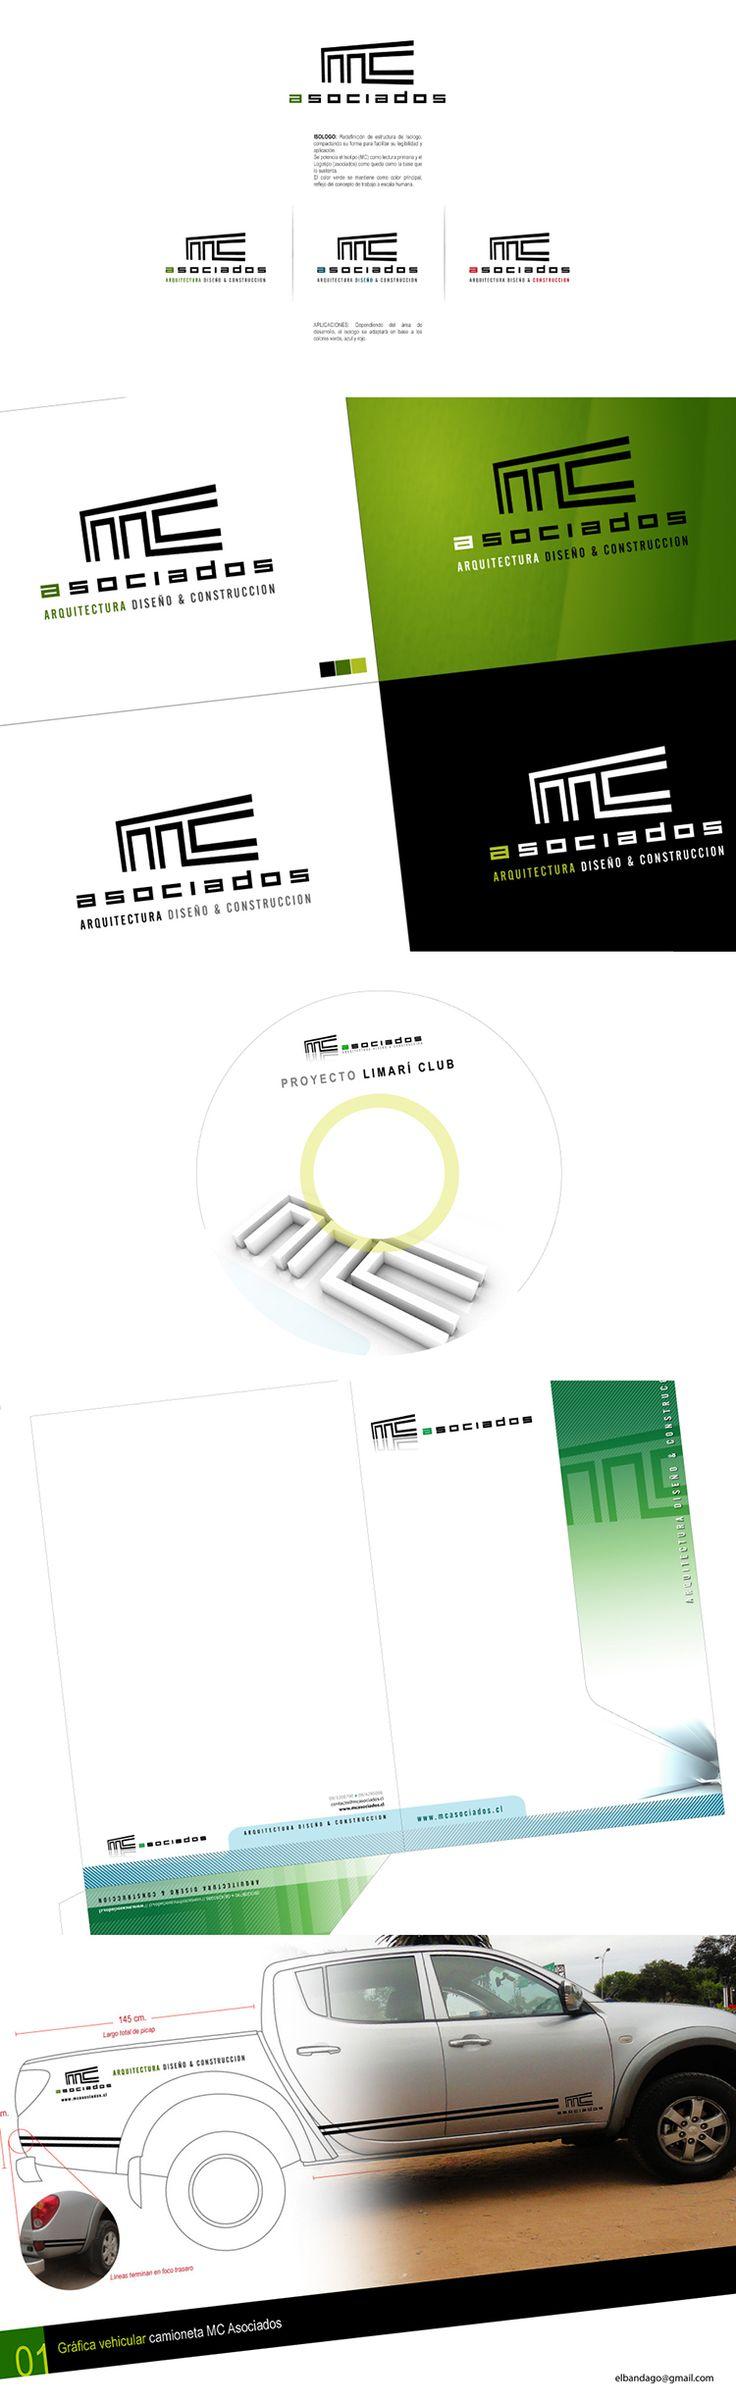 2007 / MC Asociados on Behance #graphic #design #branding #logotype #illustrator #photoshop